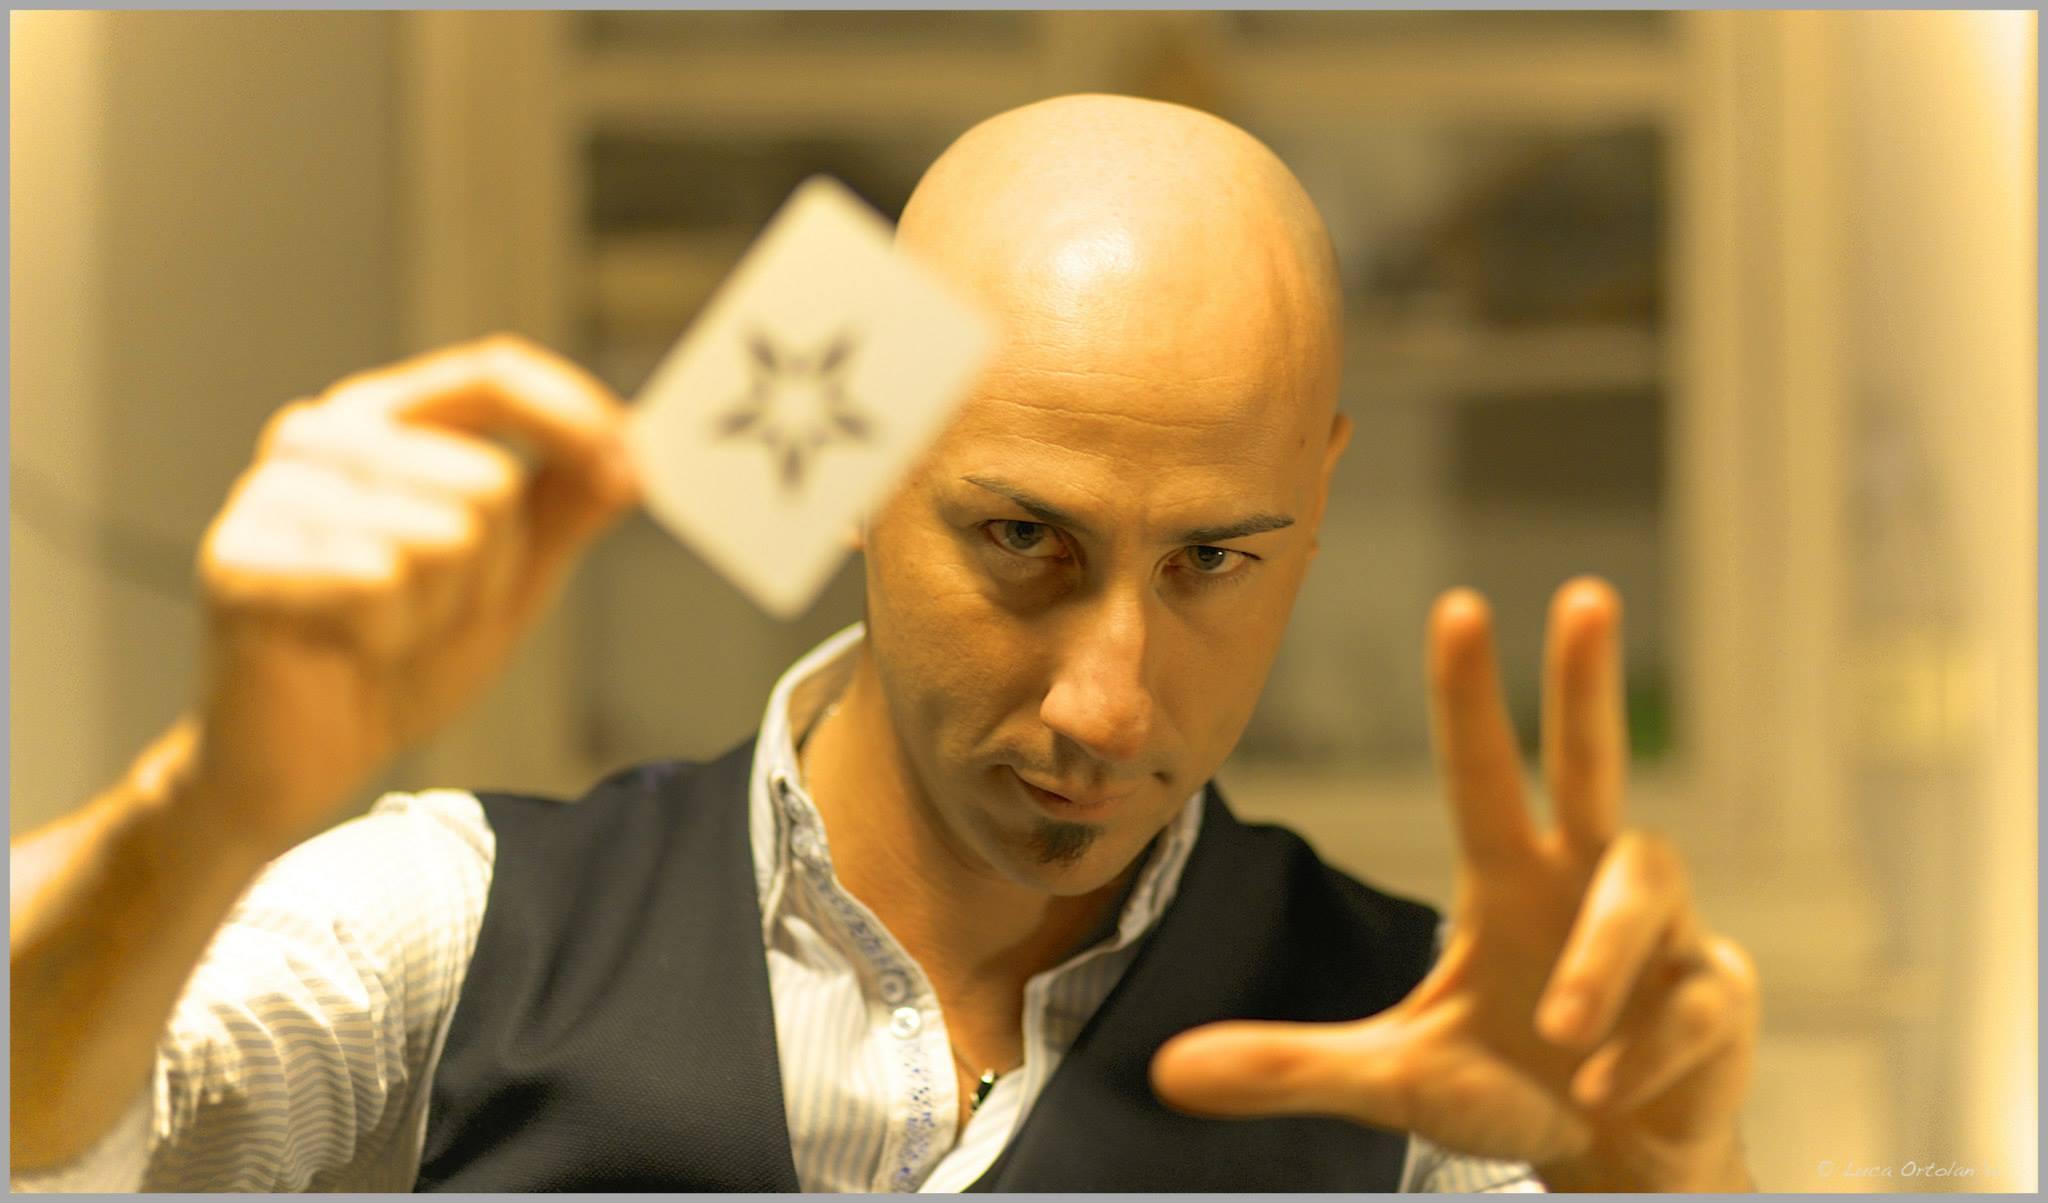 Emanuele Spina – Il Mentalista